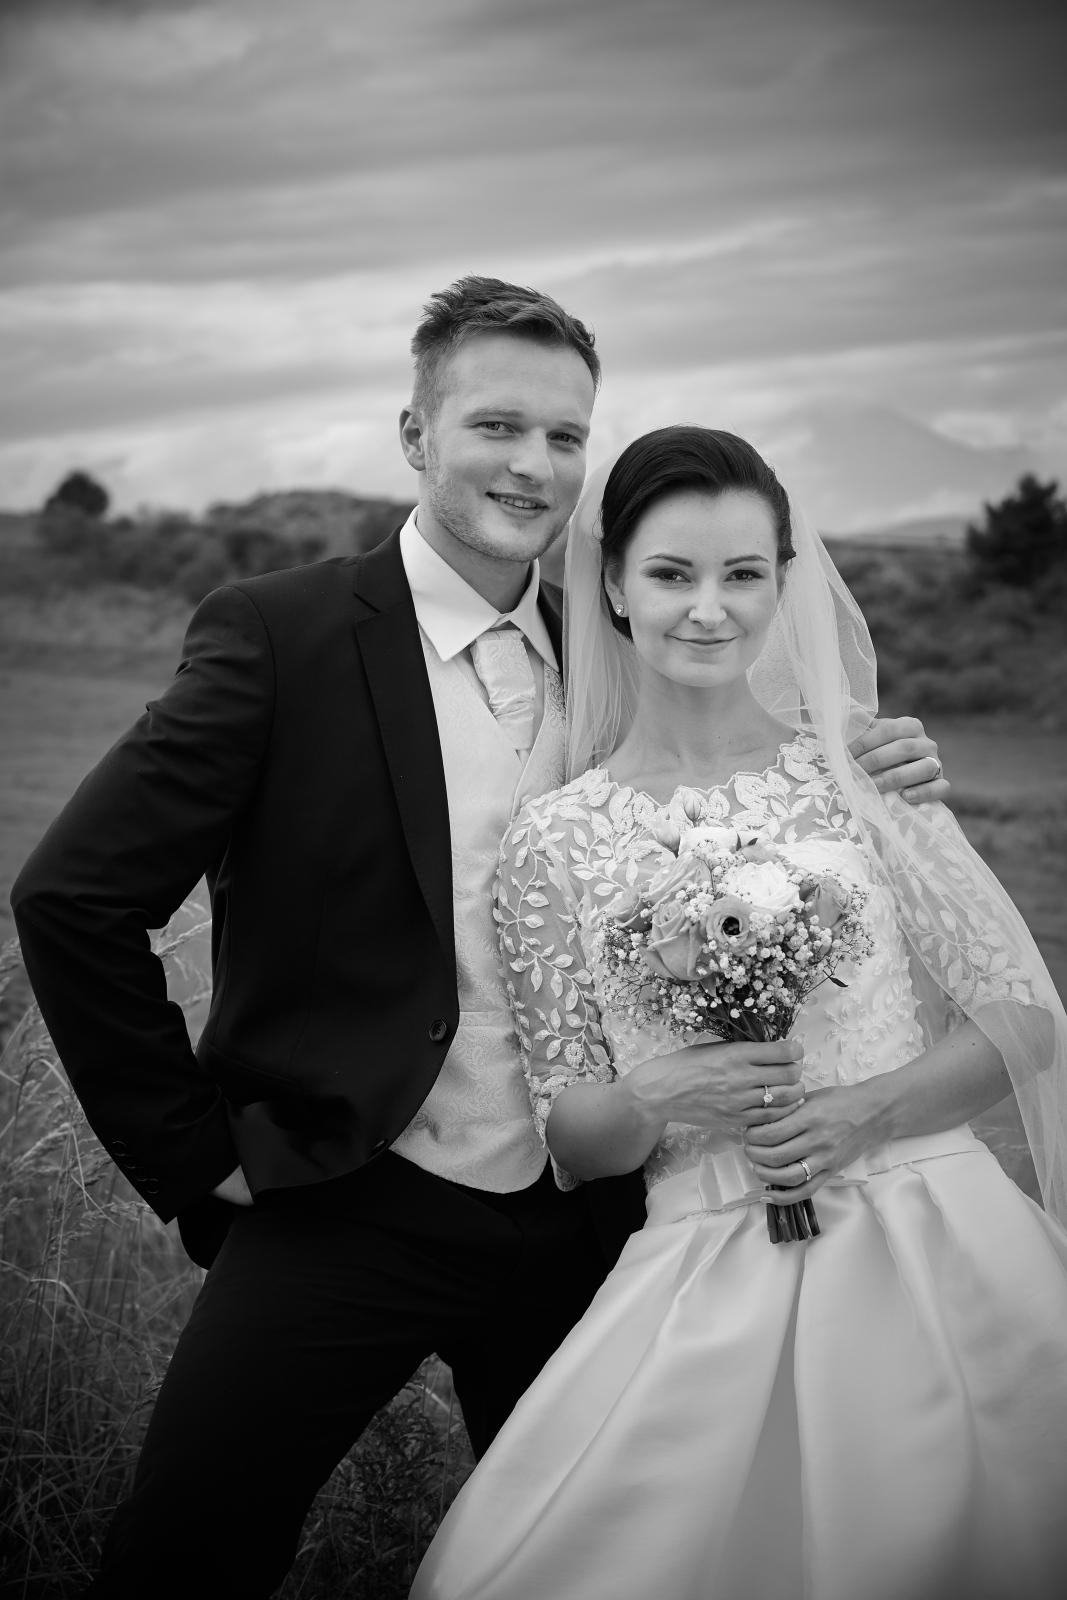 Svadba M+M - Obrázok č. 8